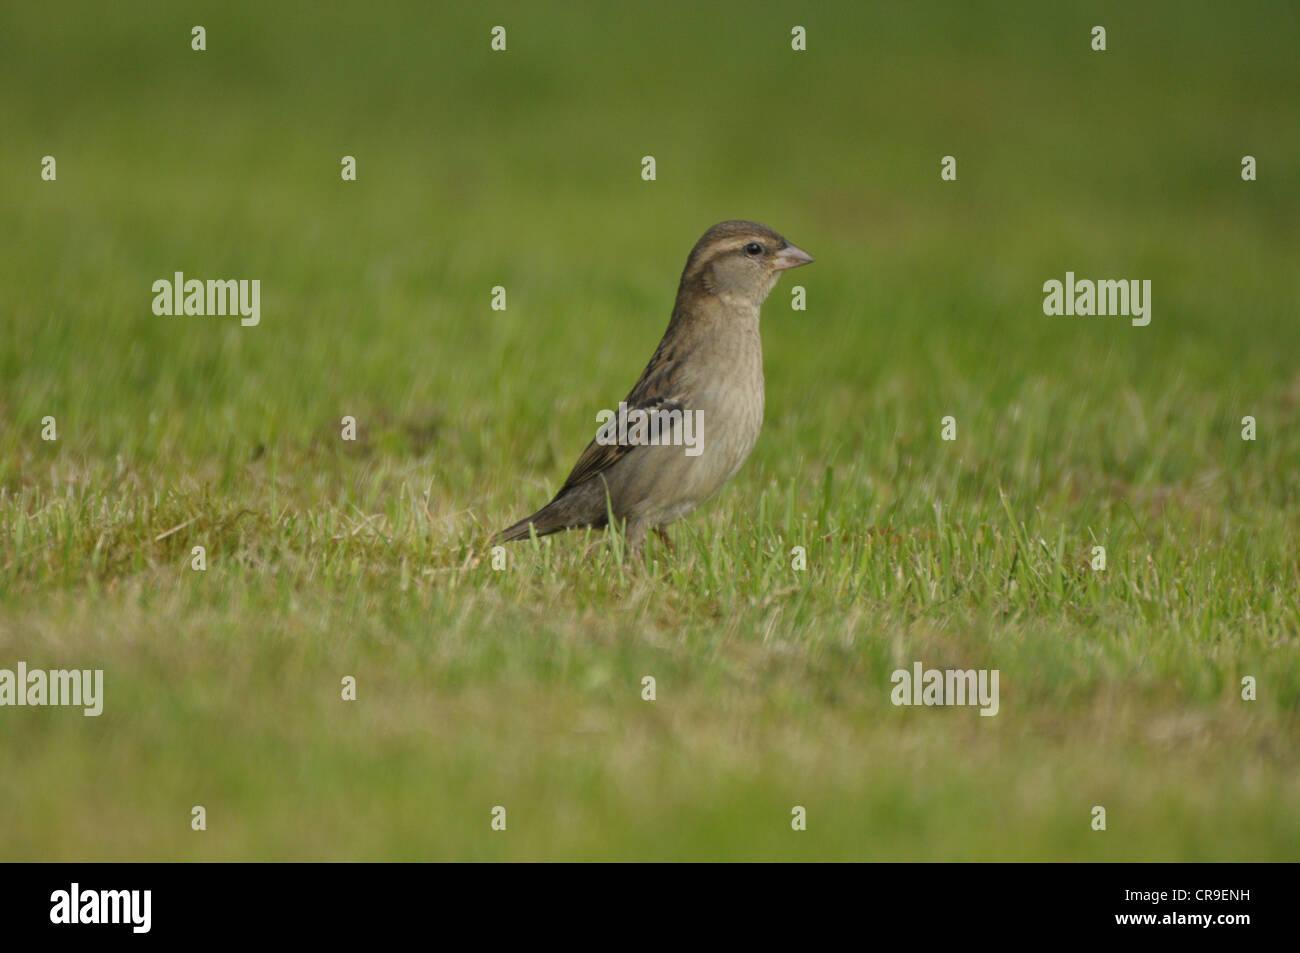 Female House Sparrow, (Passeridae) on grass, Scotland. - Stock Image